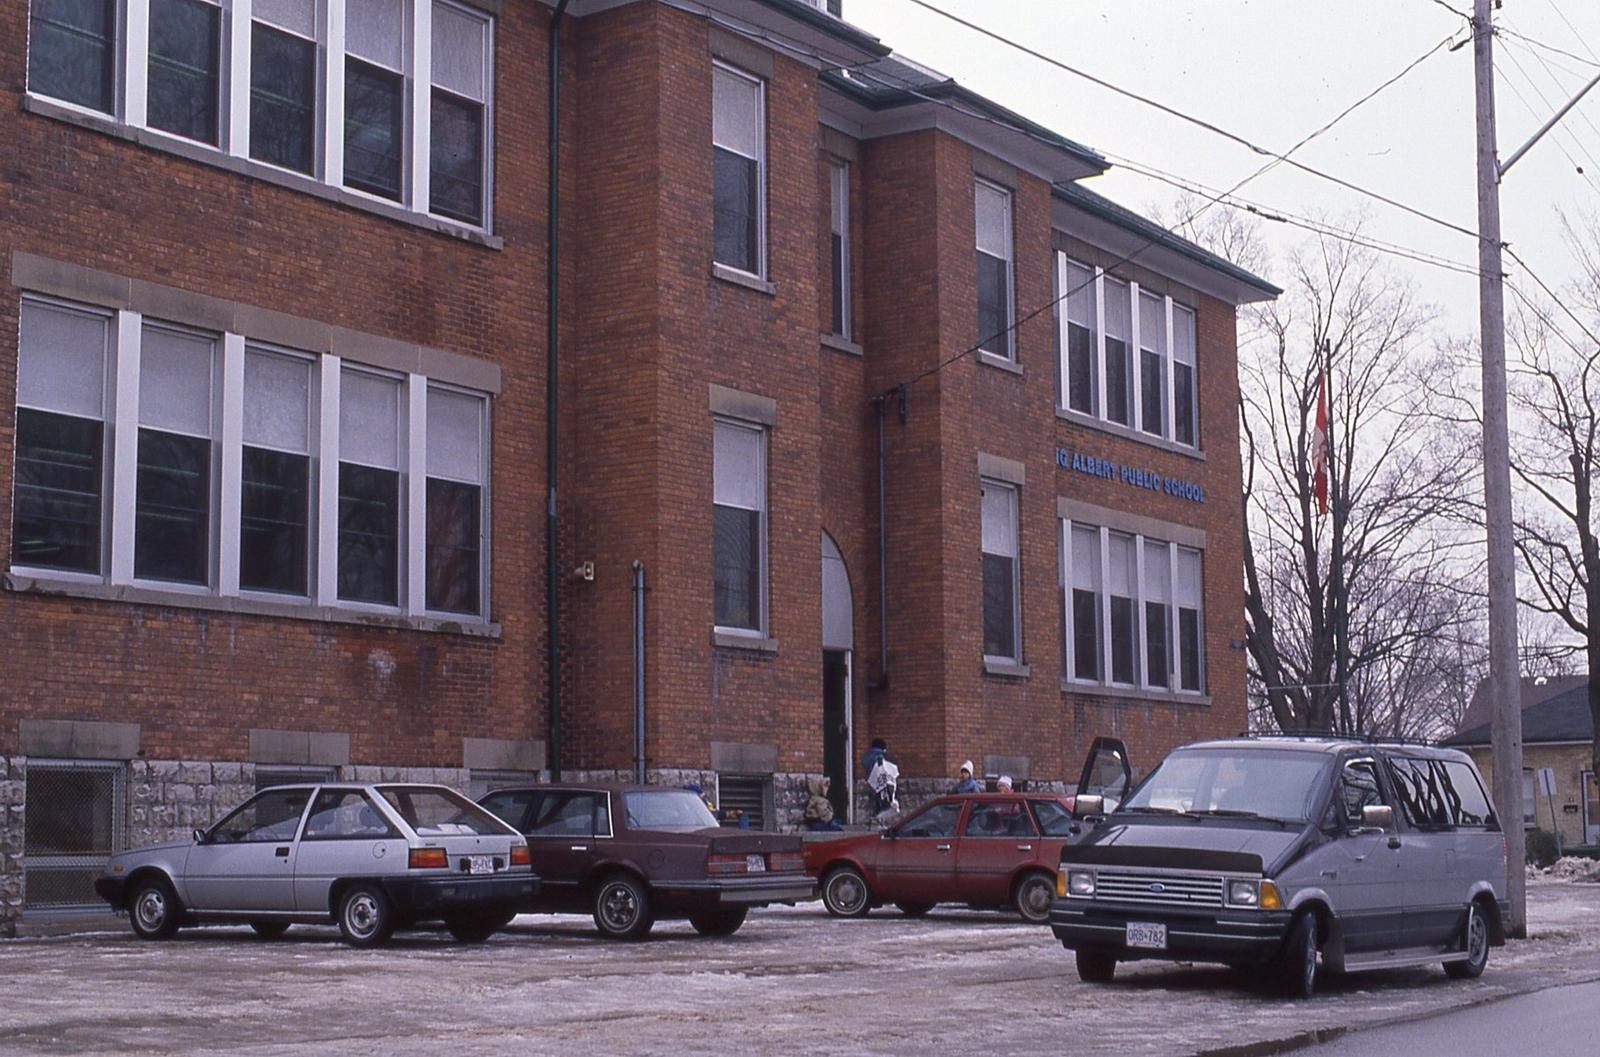 King Albert School, Russell Street, Lindsay